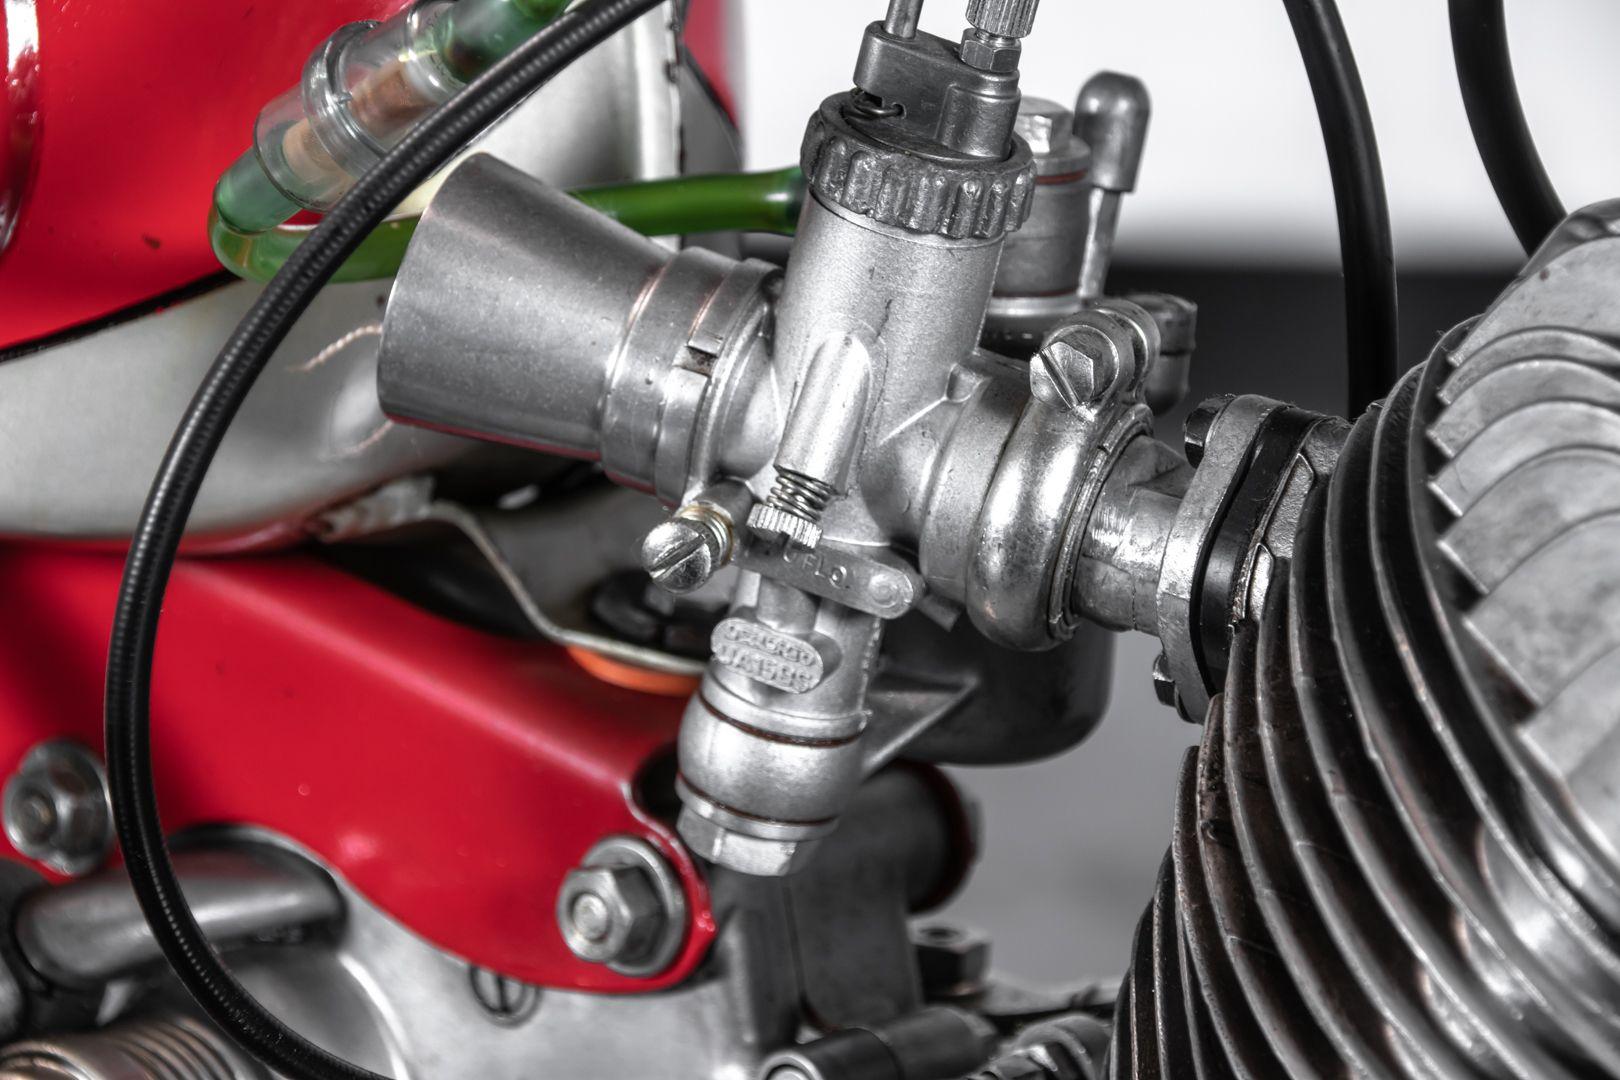 1965 Moto Morini Corsarino Z 77583